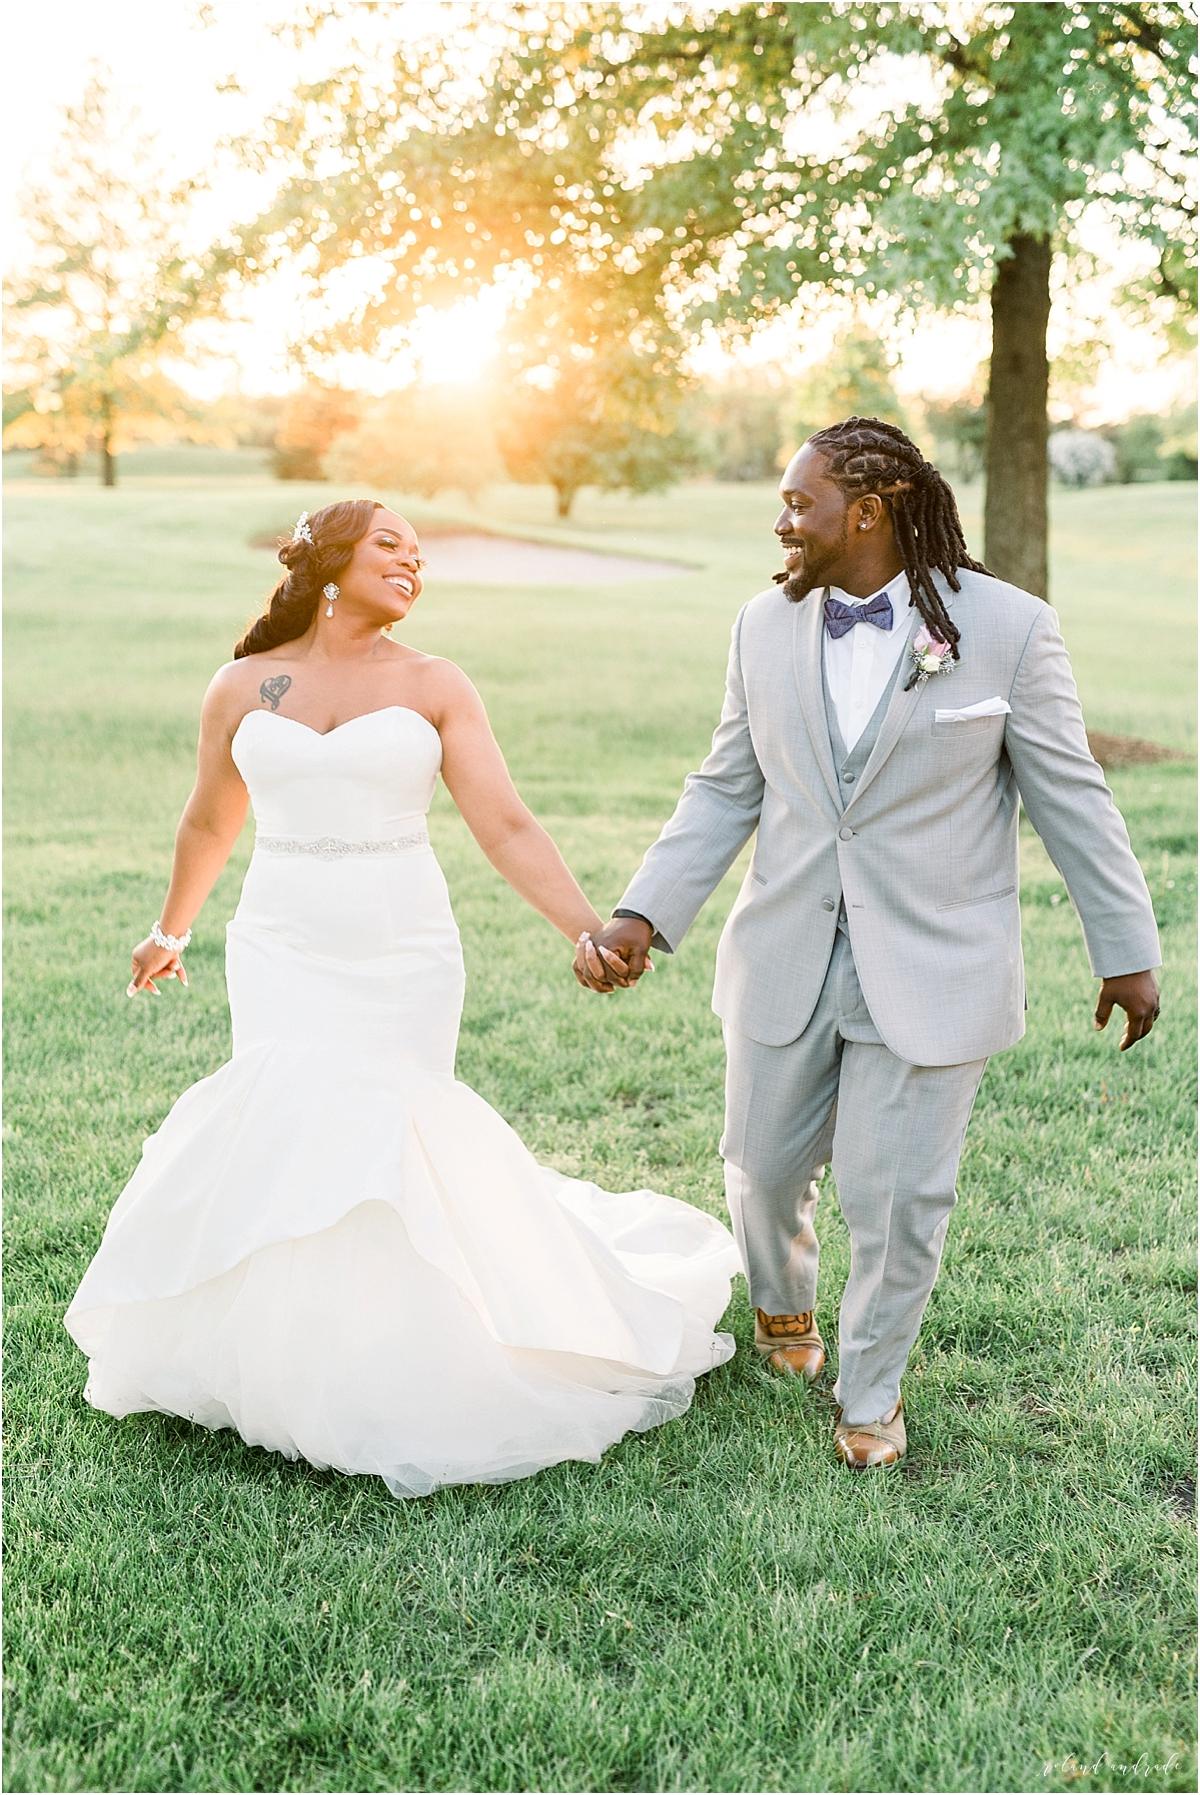 The Odyssey Wedding, Tinley Park Wedding, Chicago Wedding Photographer, Best Photographer In Tineley Park, Best Photographer In Chicago, Light And Airy Photographer_0066.jpg